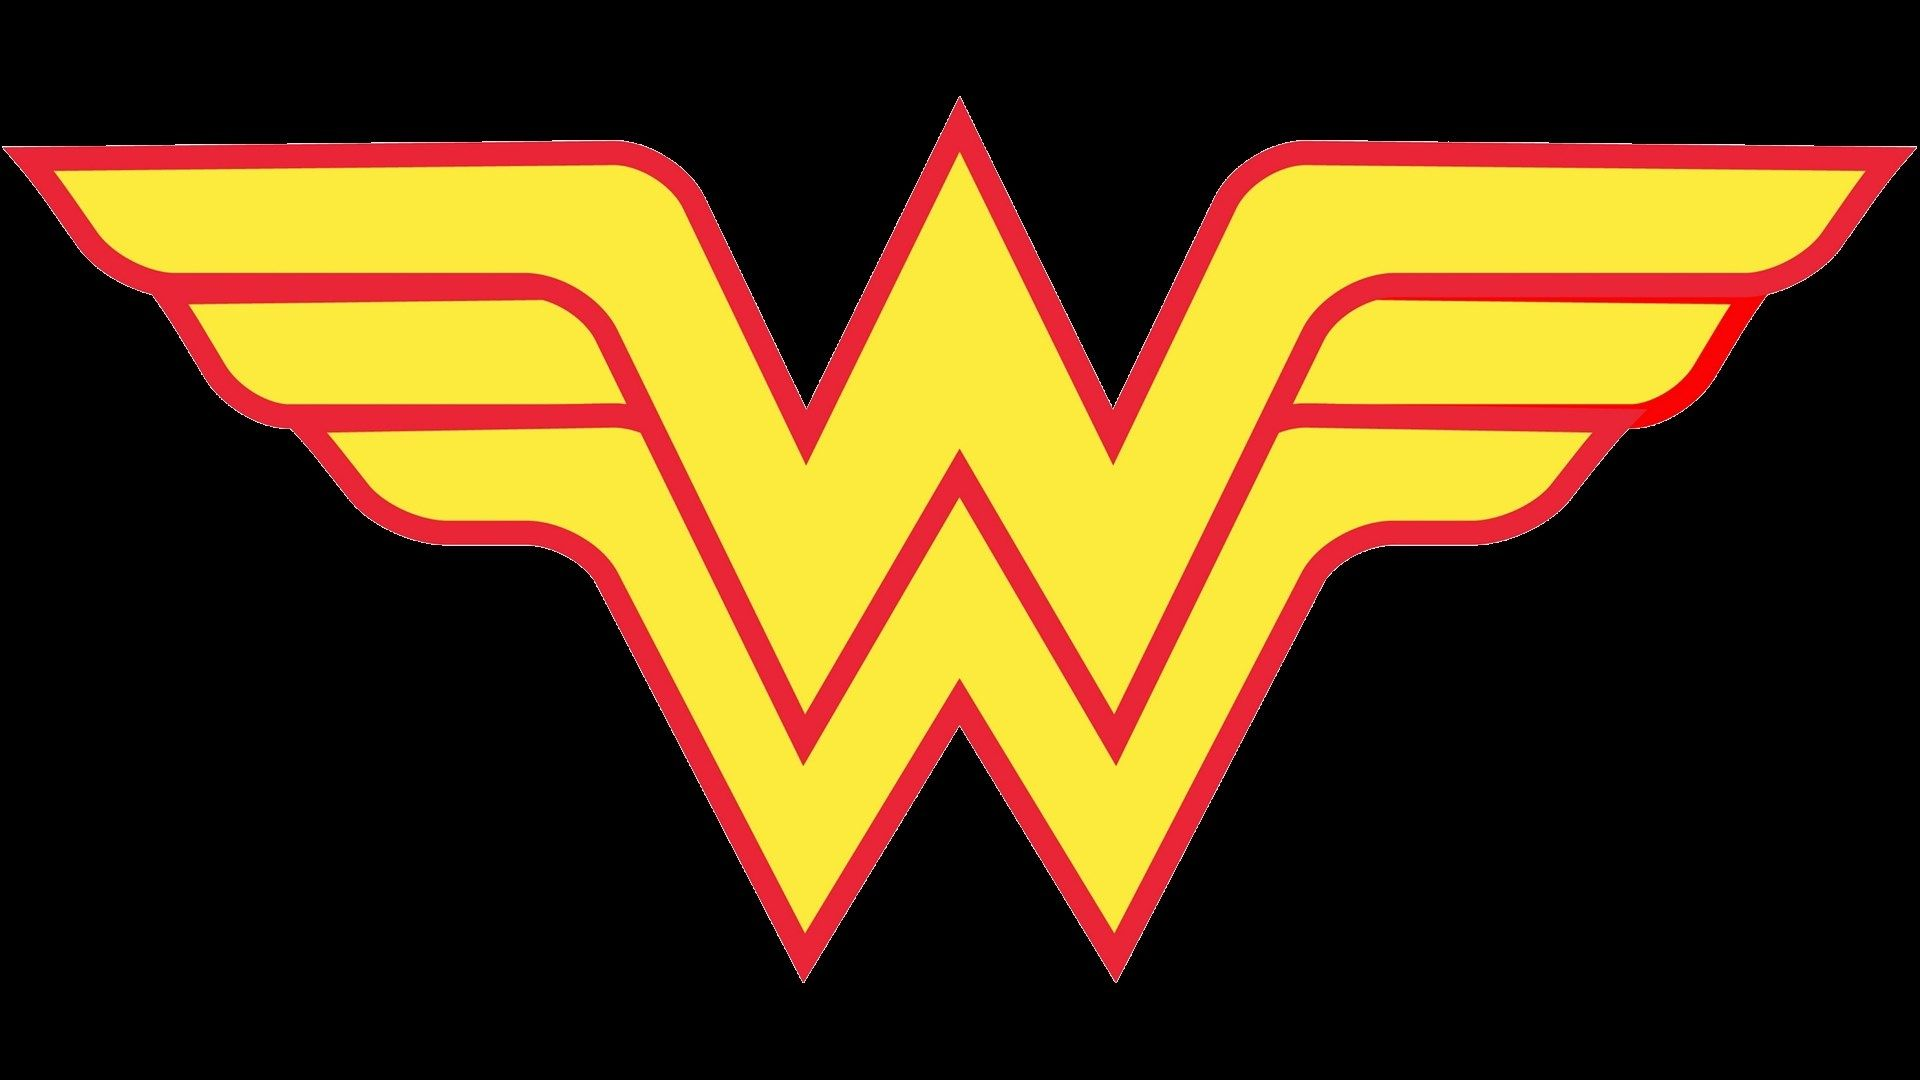 Wonder Woman Wallpaper Pack 1080p Hd 127 Kb Fielding Fletcher